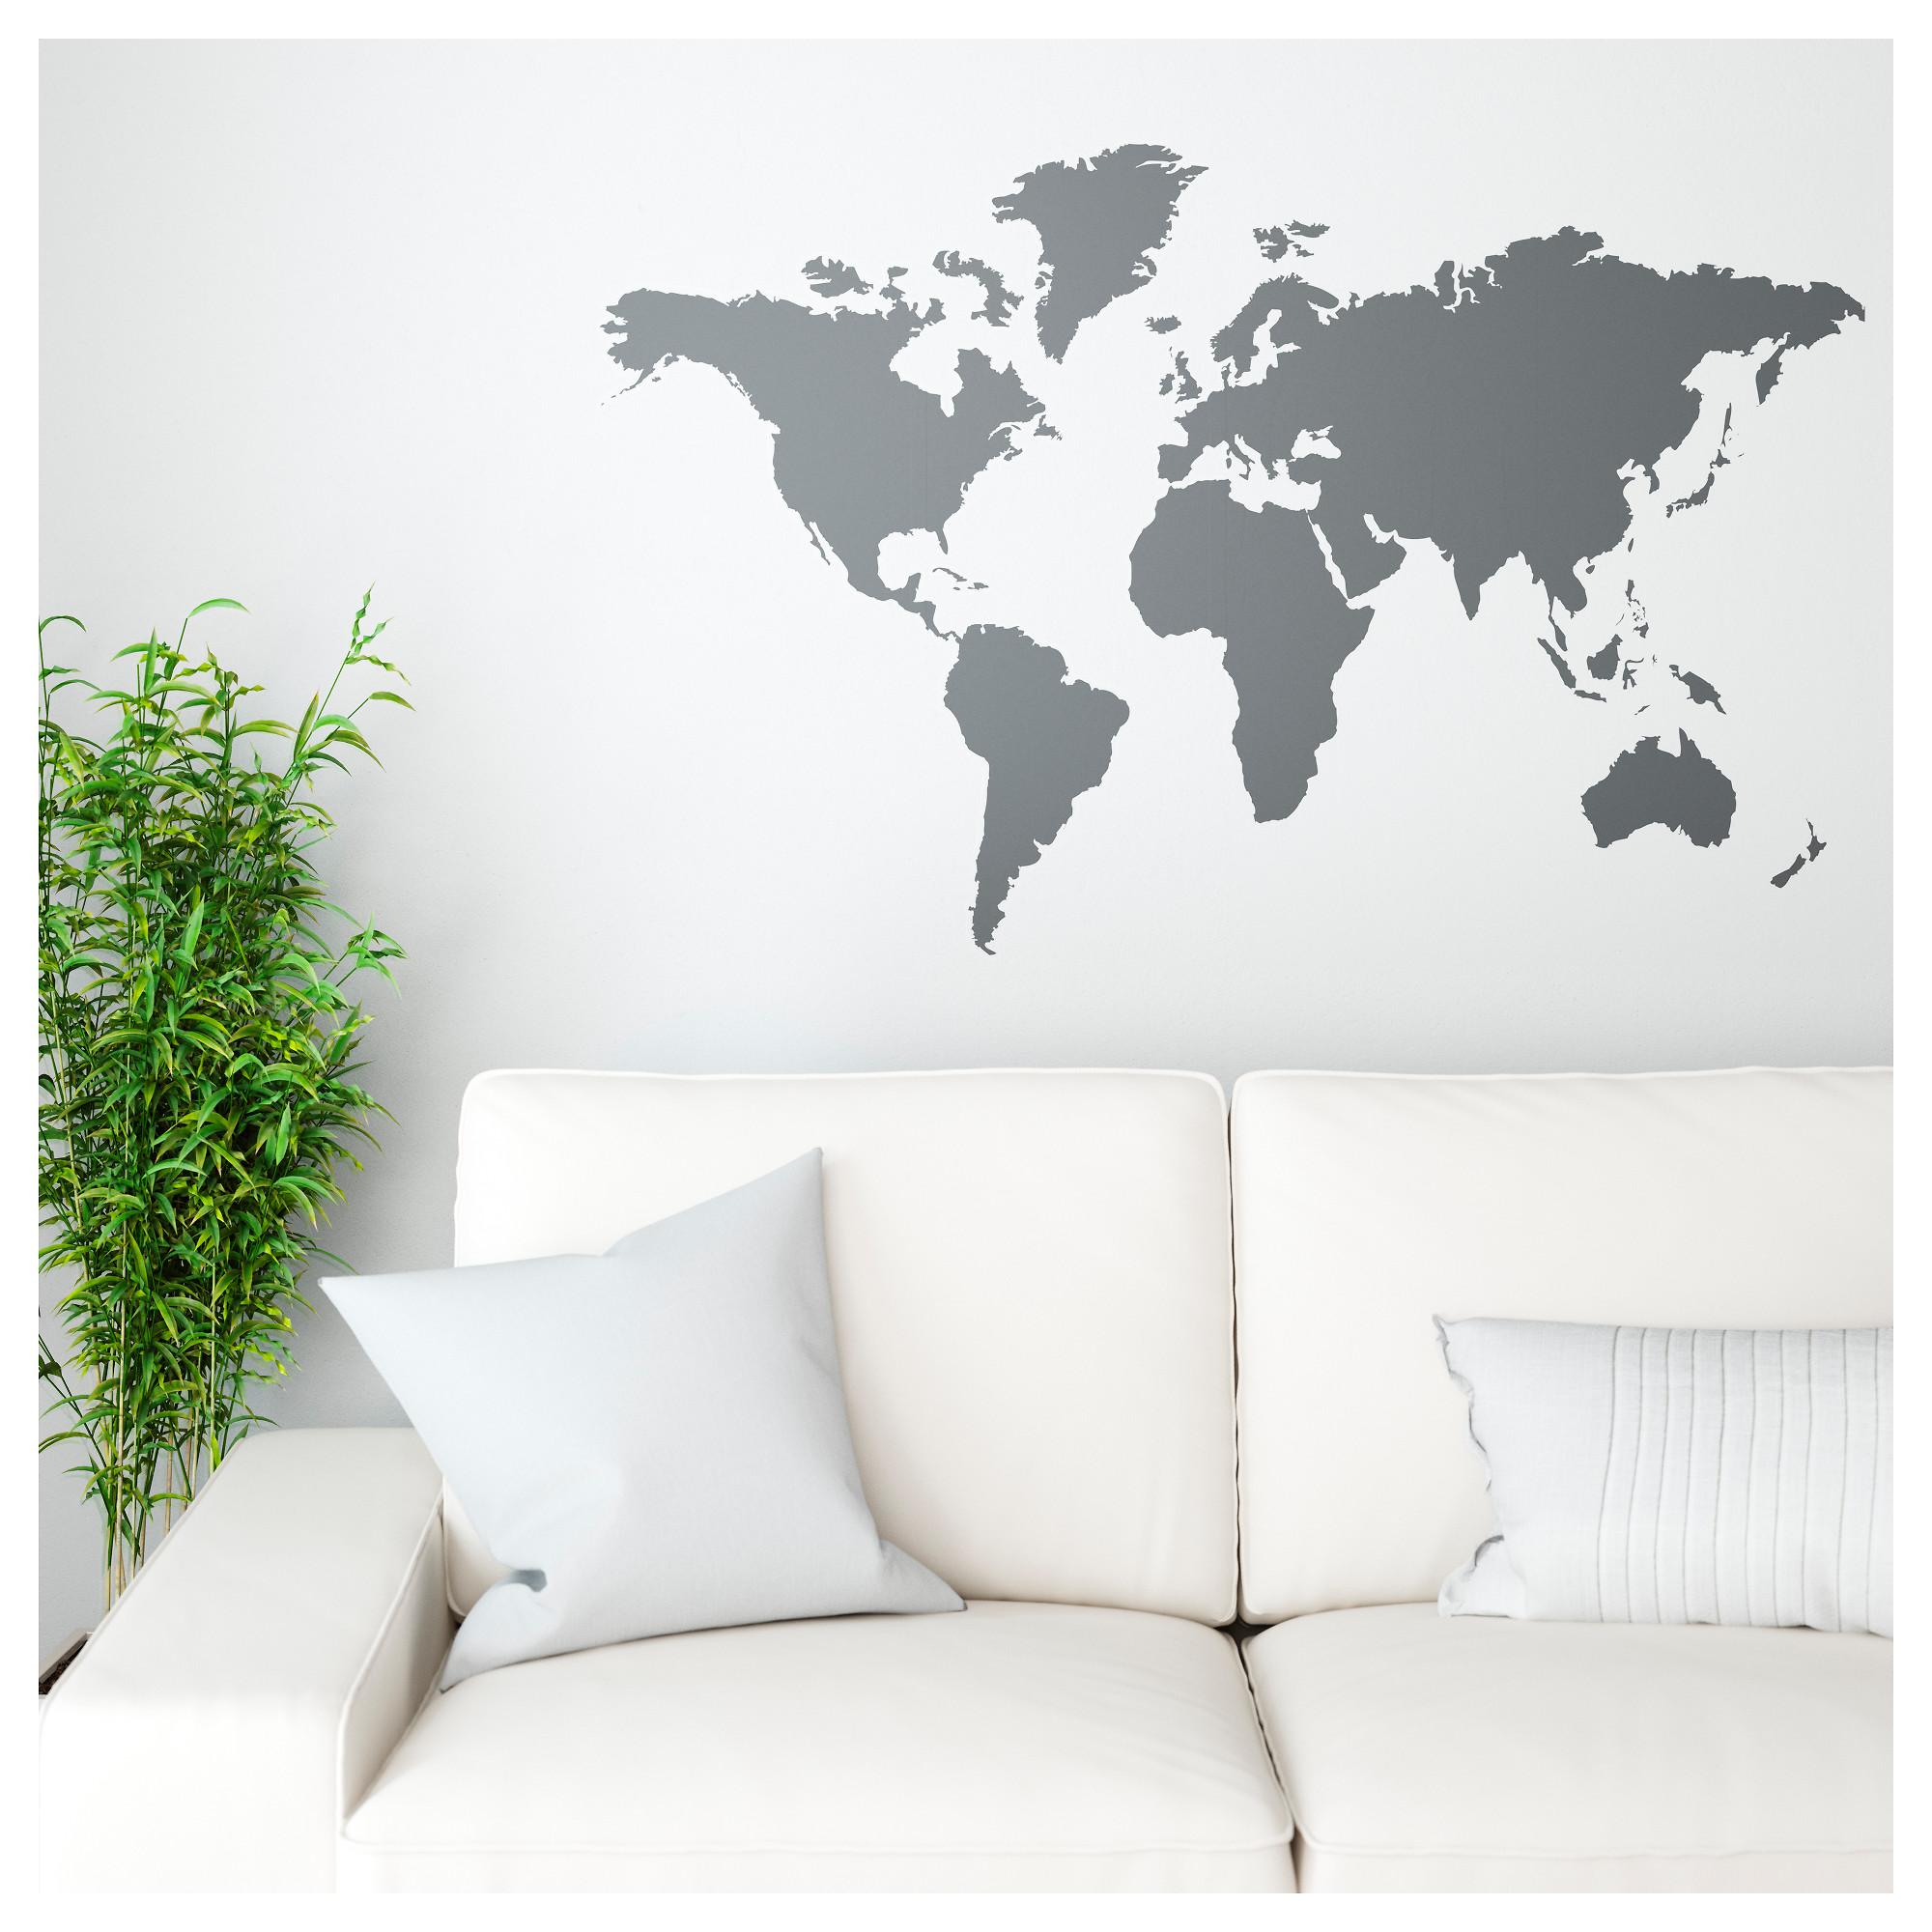 KLÄTTA - decoration stickers, blackboard world   IKEA Hong Kong on giant wall world map, ikea wardrobe assembly fail, ikea prints,